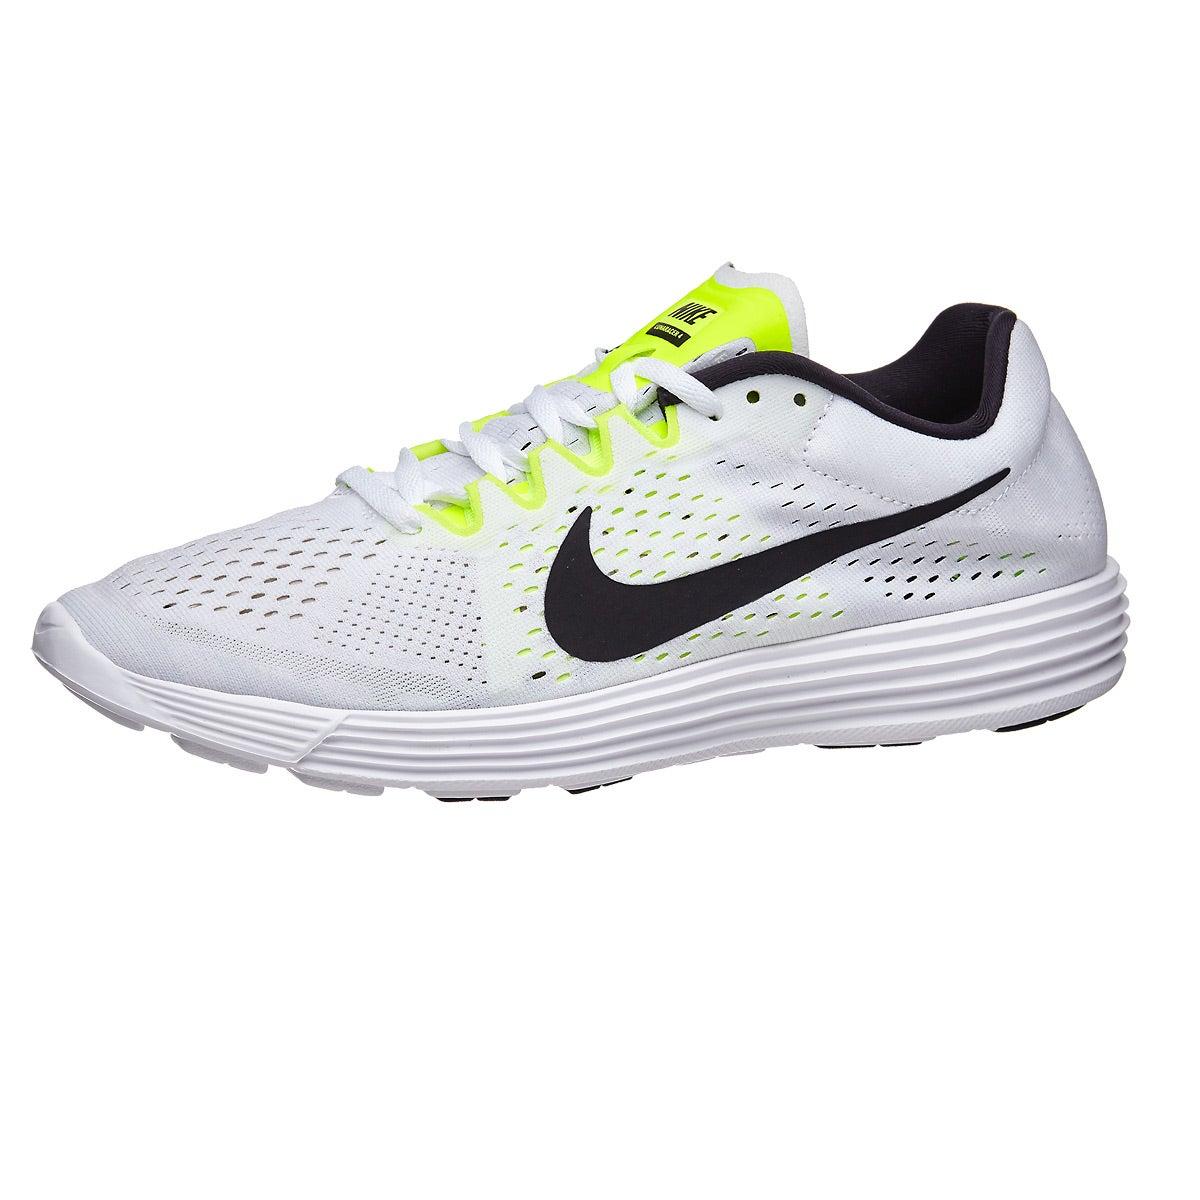 b855649ef58 ... netherlands nike lunaracer 4 mens shoes whiteblackvolt 360 view running  warehouse. 83b2f 55977